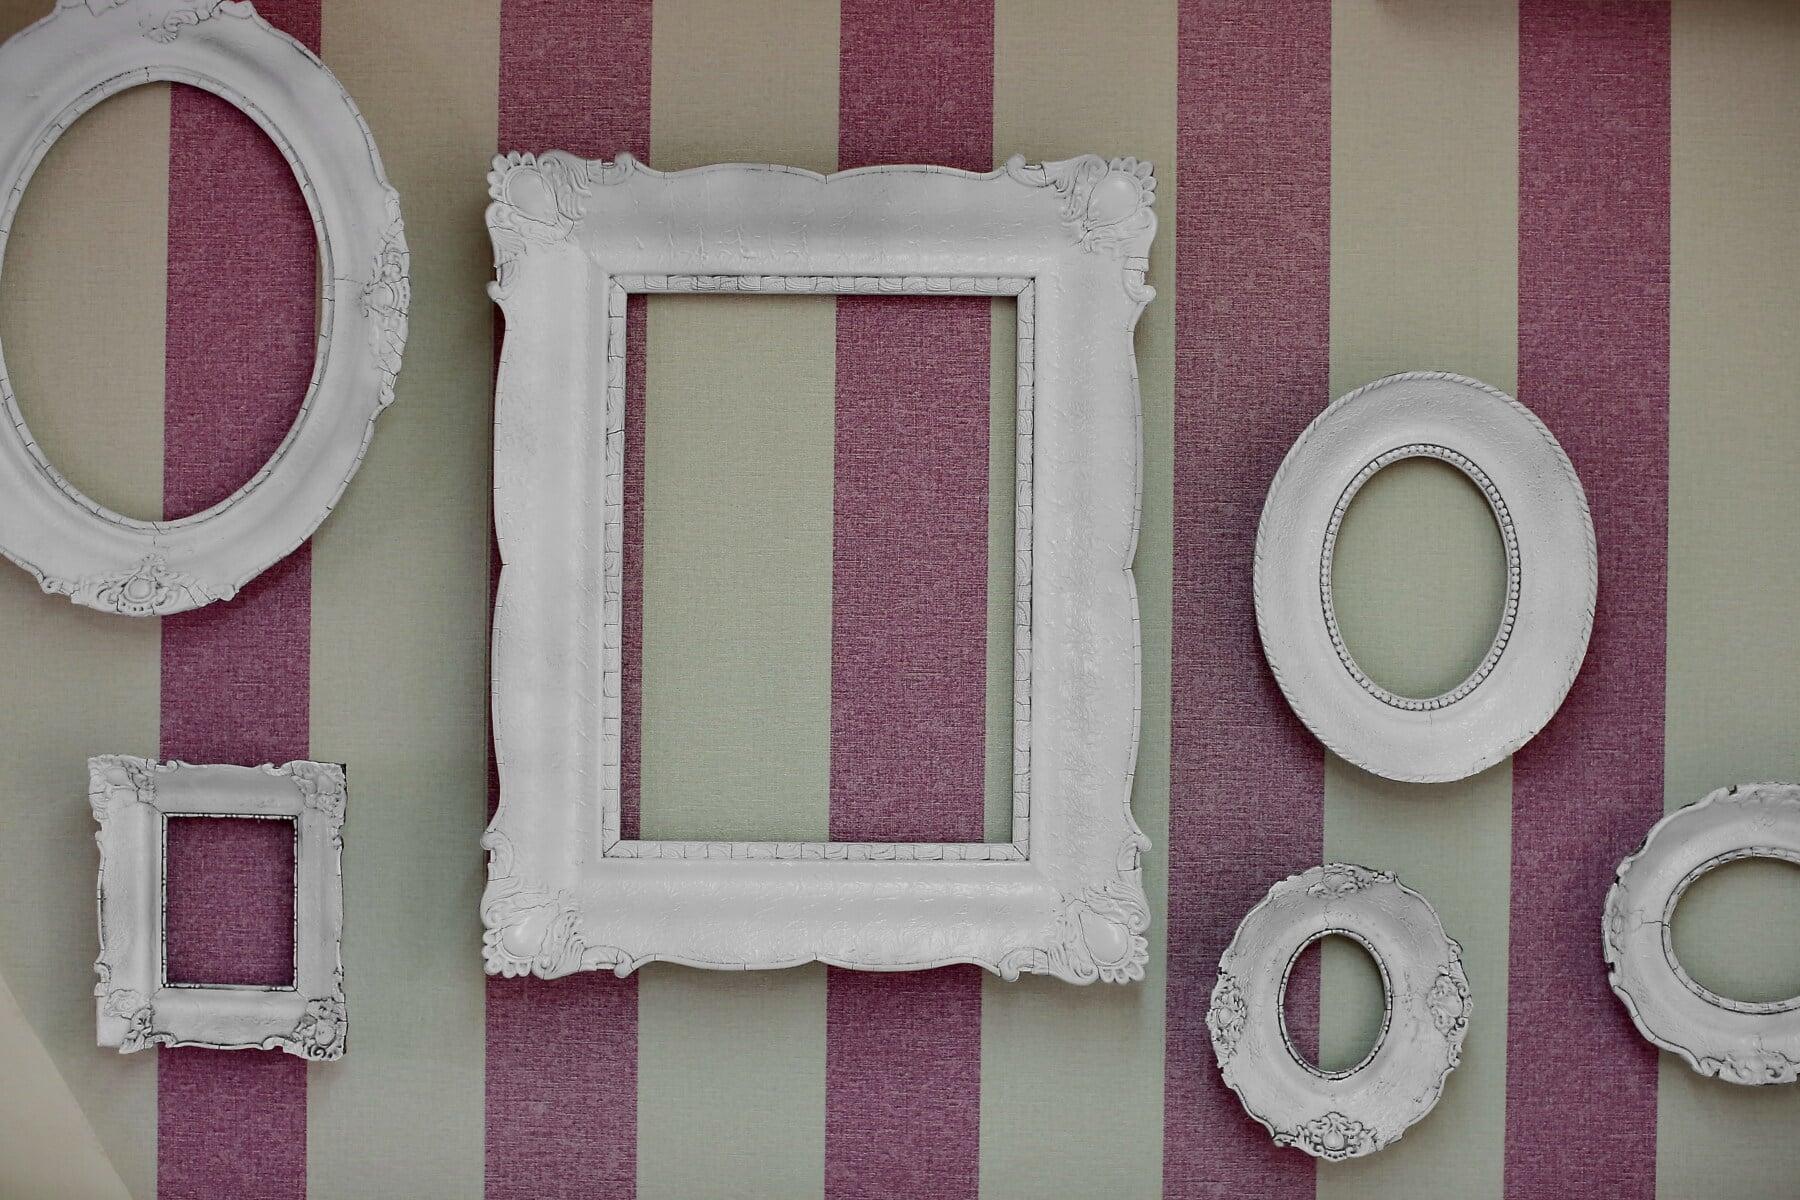 pinkish, wall, vintage, frame, design, framework, retro, antique, empty, decoration